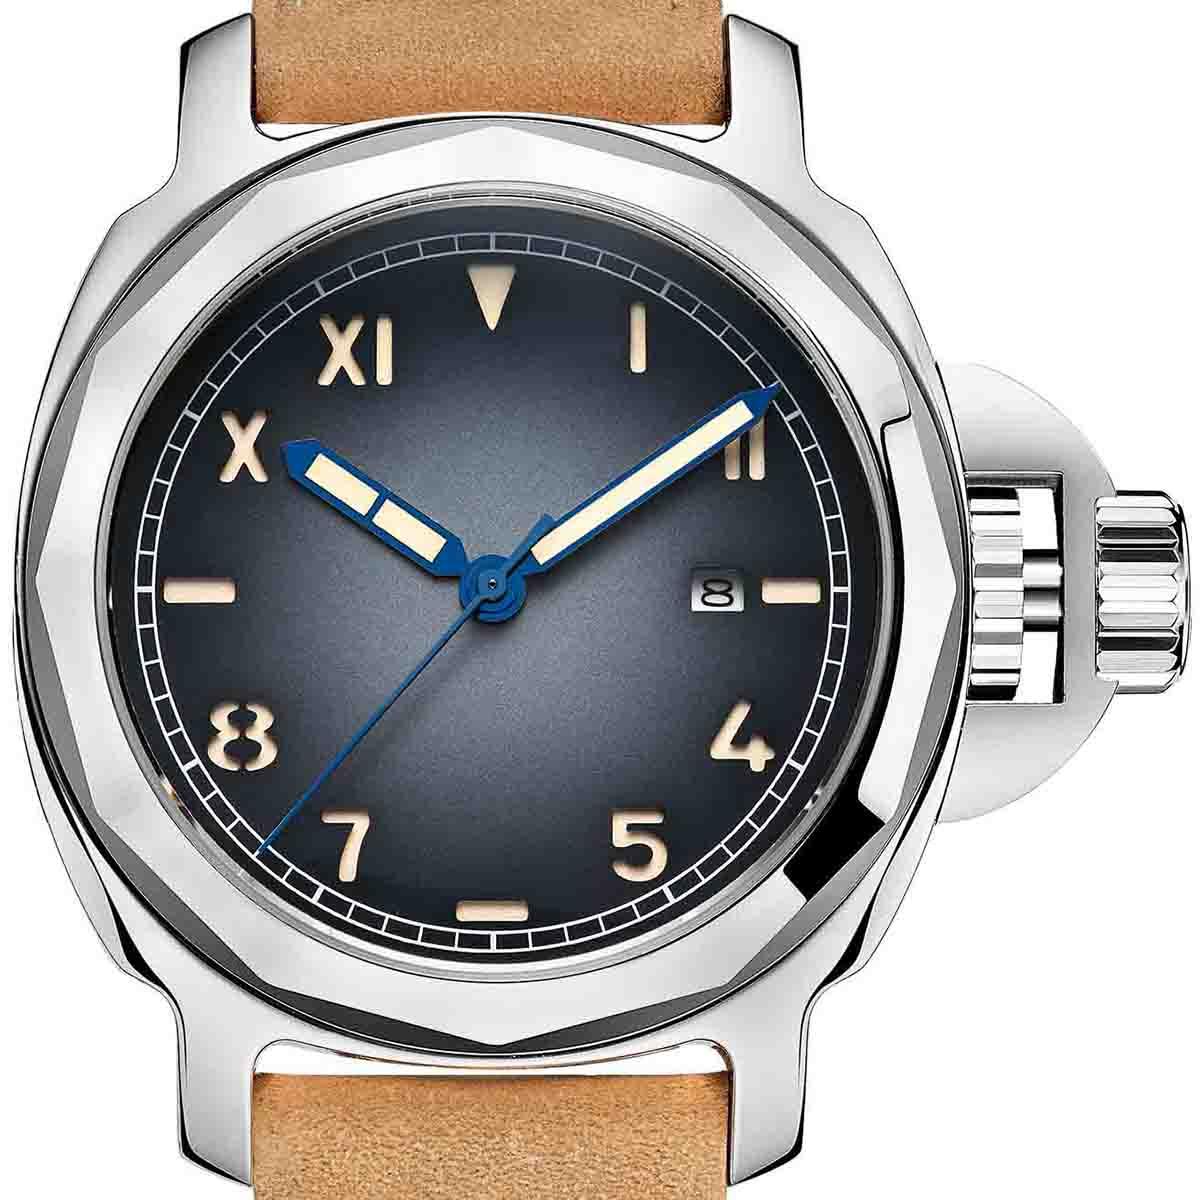 【NEW】PARNIS パーニス 自動巻き 腕時計 [PA6027-S3AL-SVBL] 並行輸入品 純正ケース メーカー保証12ヶ月